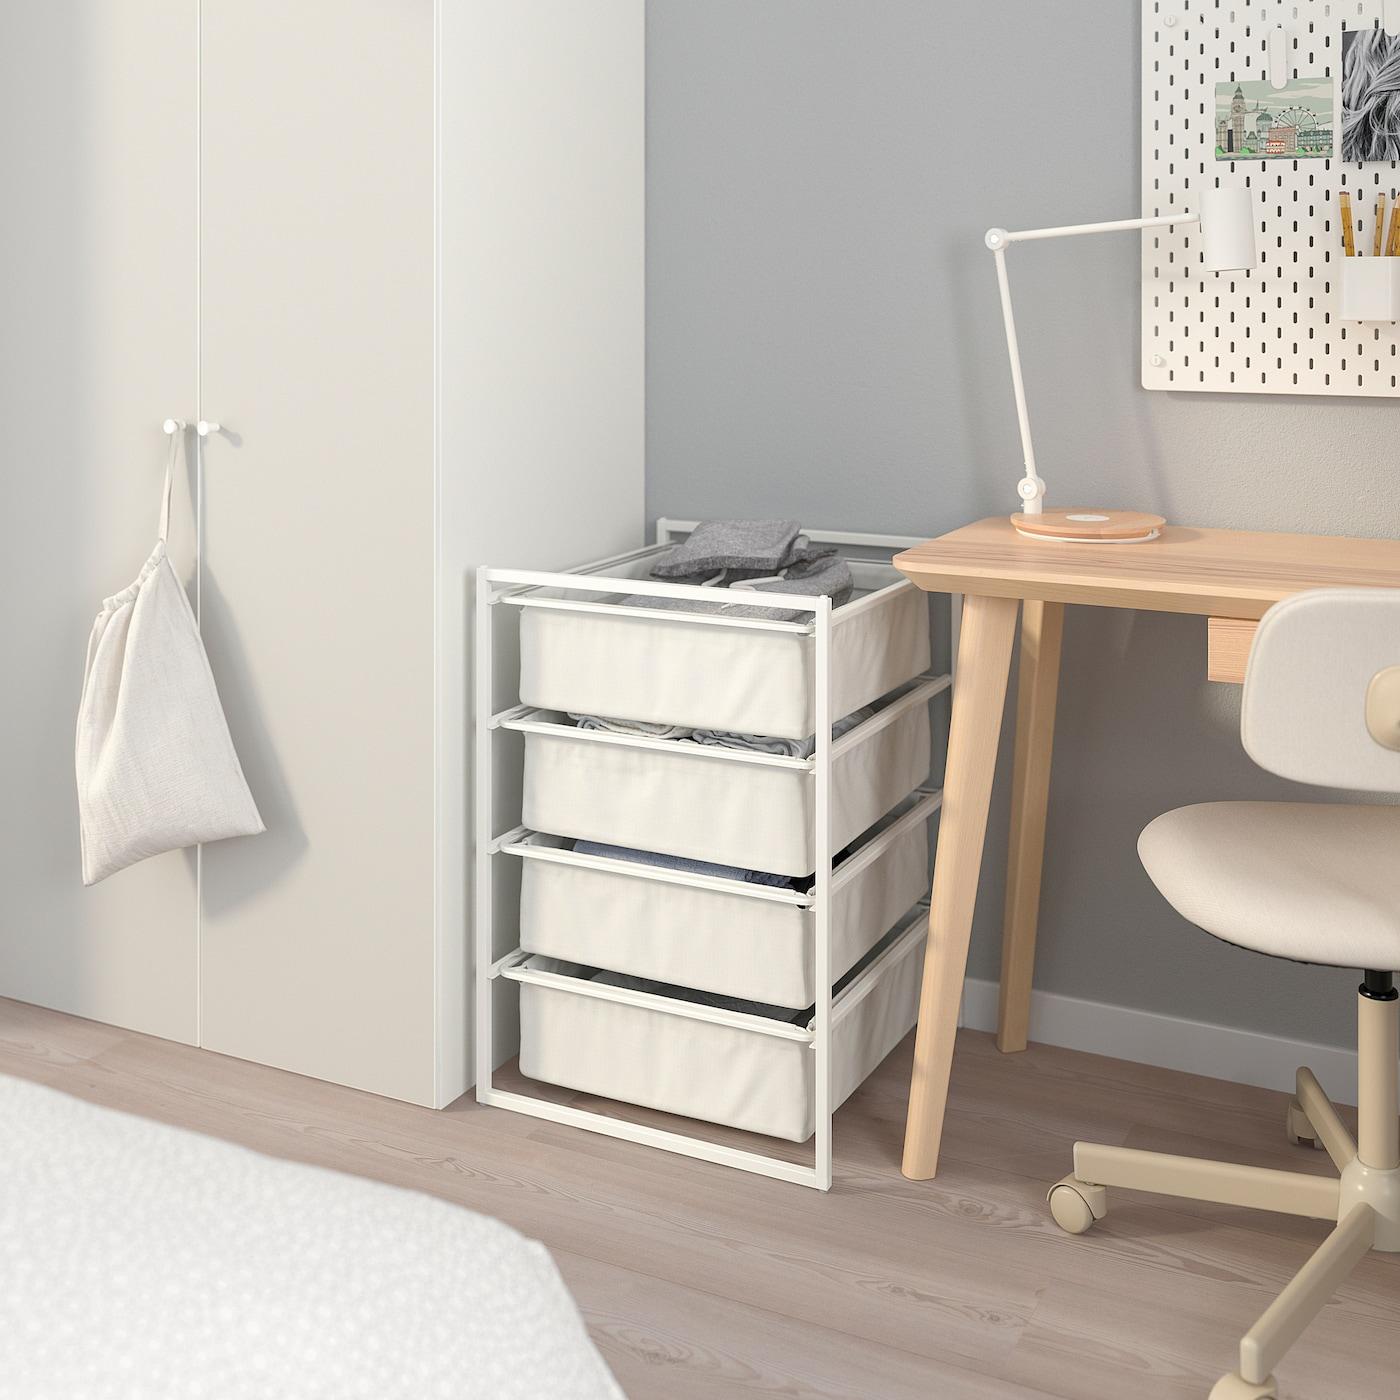 JONAXEL 尤纳赛尔 框架带纺织品篮, 白色, 50x51x70 厘米